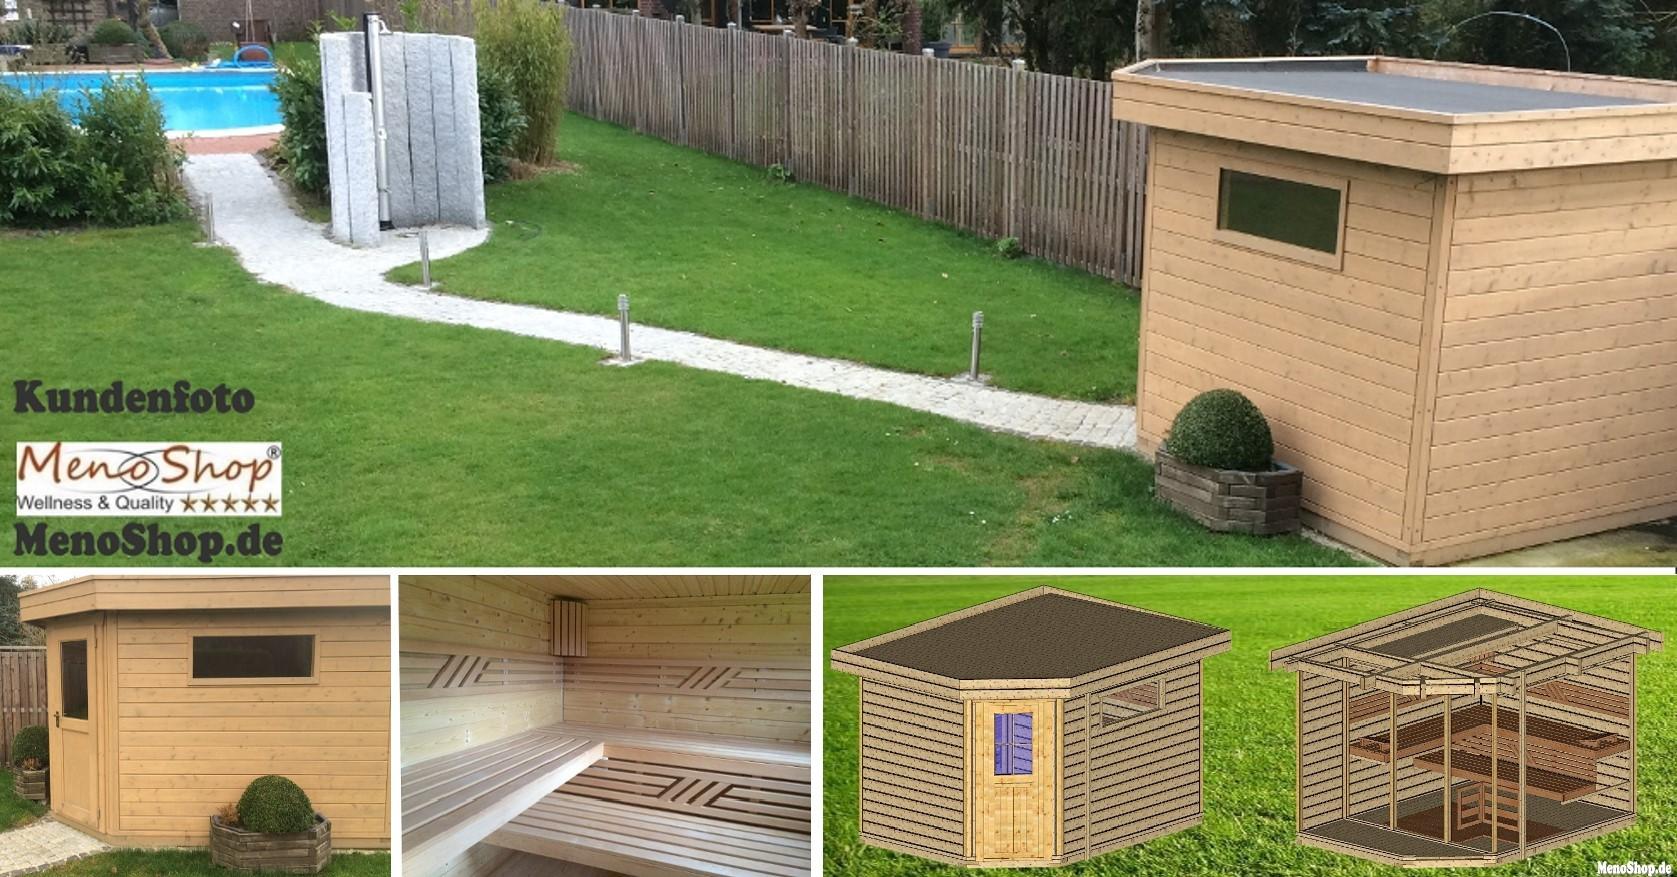 gartensauna als moderne aussensauna kaufen wellness sauna. Black Bedroom Furniture Sets. Home Design Ideas